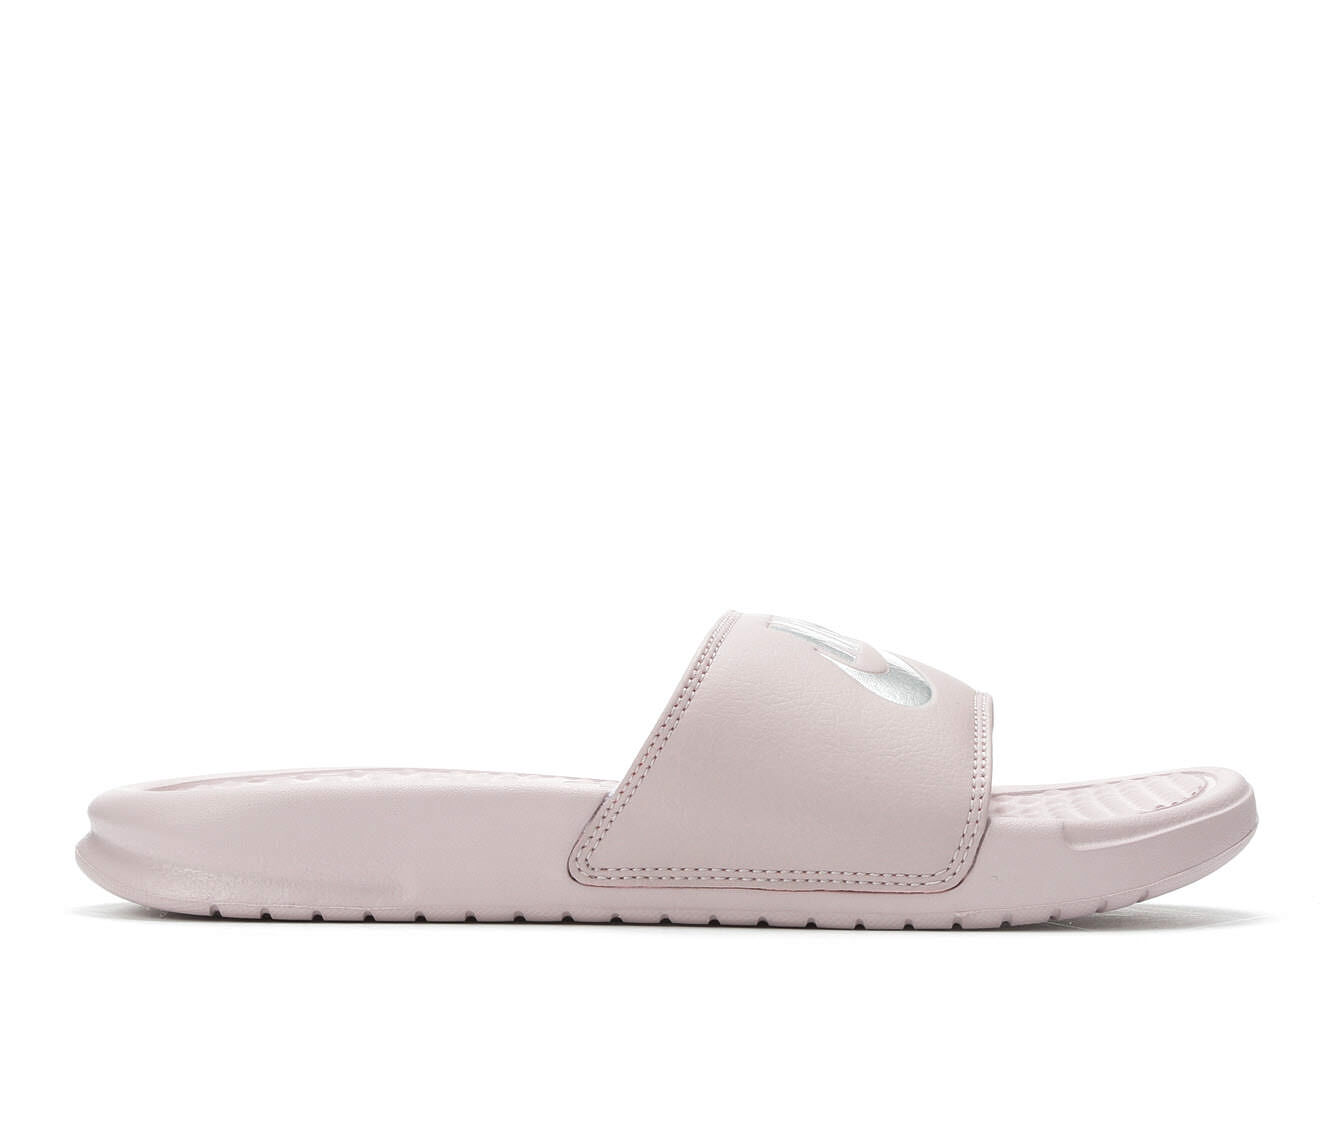 Women's Nike Benassi JDI Slide Sandals Rose/Met Silver